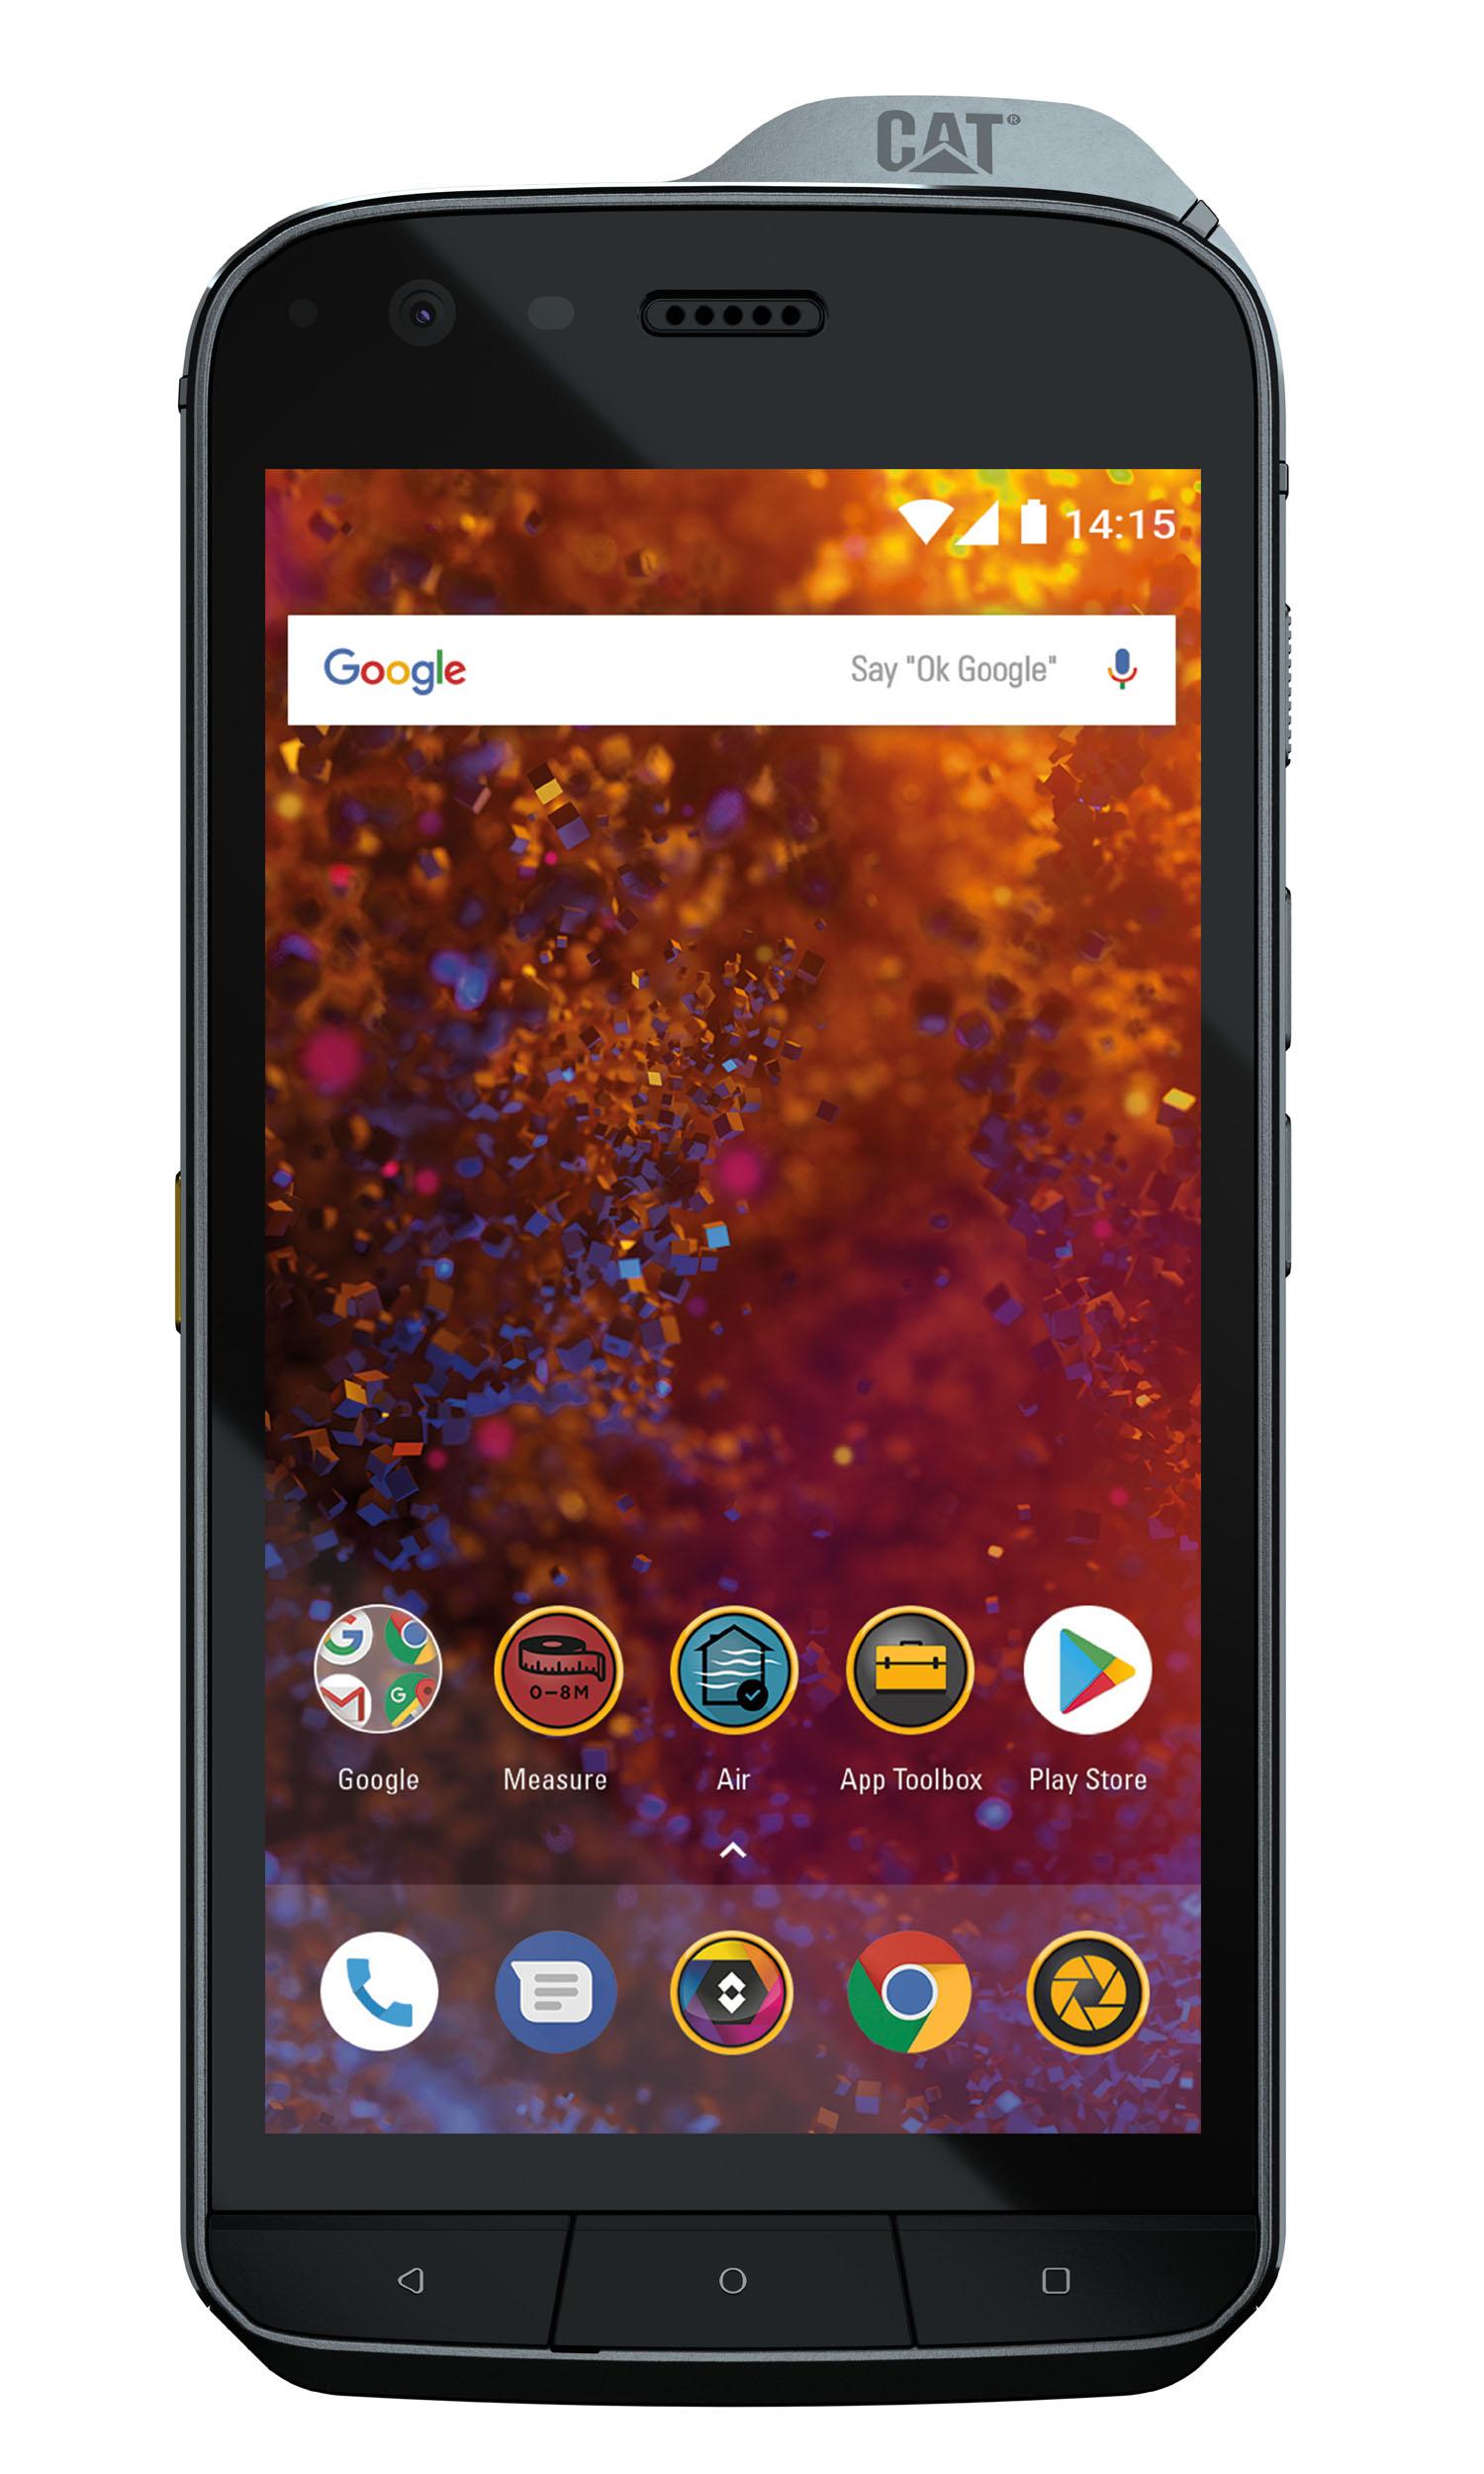 vb1156104 S61 Front V5 RGB